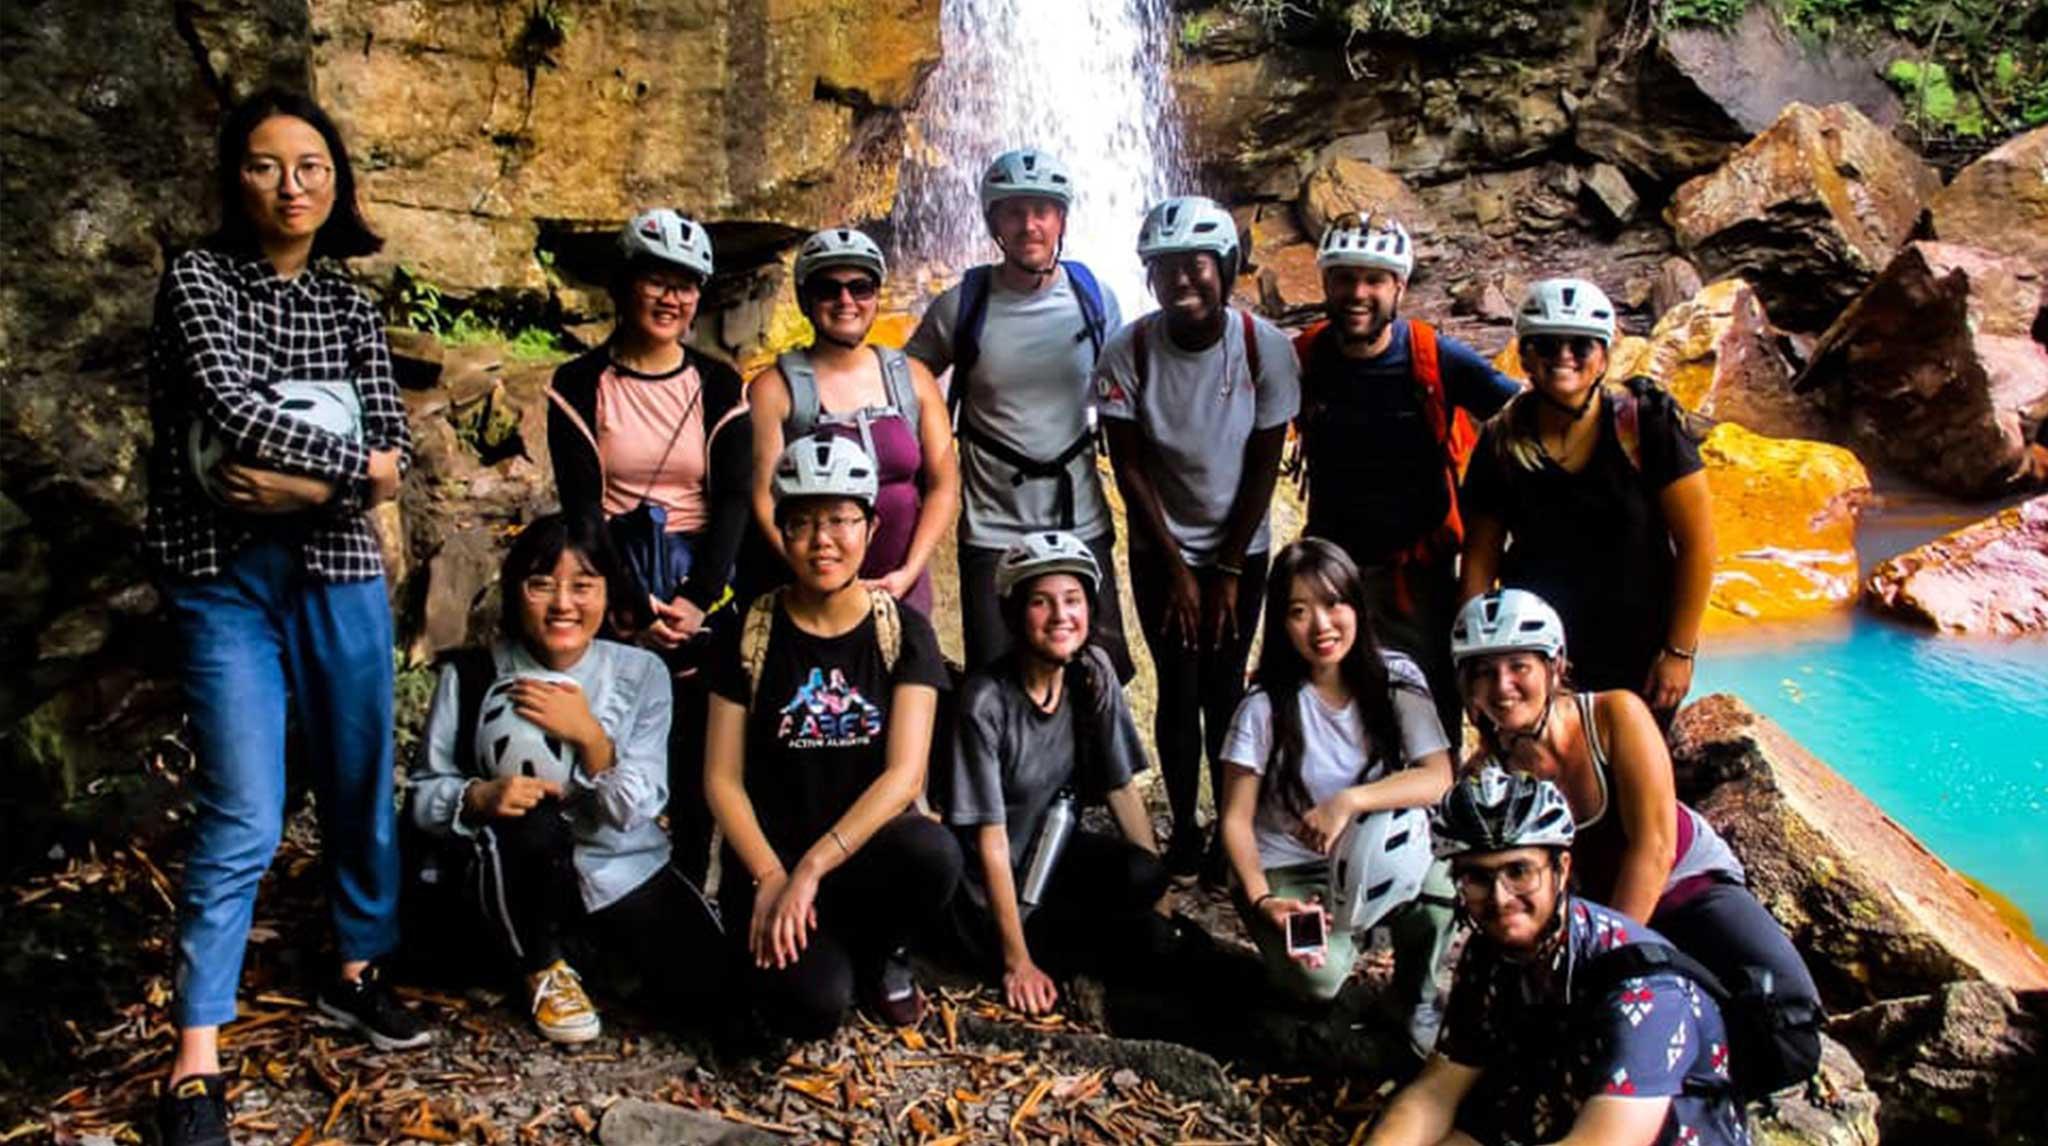 students on mountain biking trip